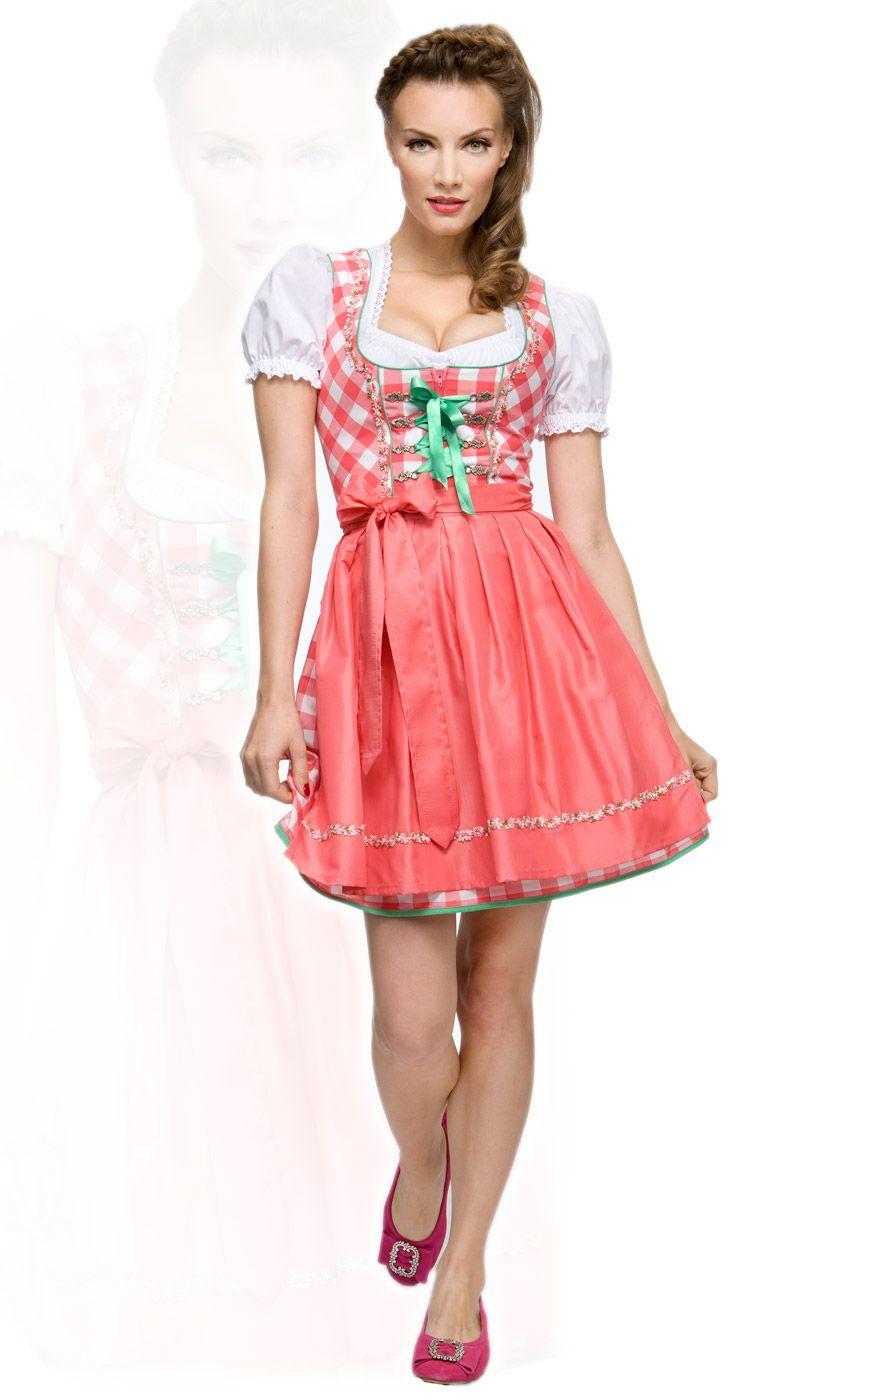 Womens Hose Rosy Traditional Costume Lederhose Stockerpoint Outlet Best Place VNvaKjKbi5